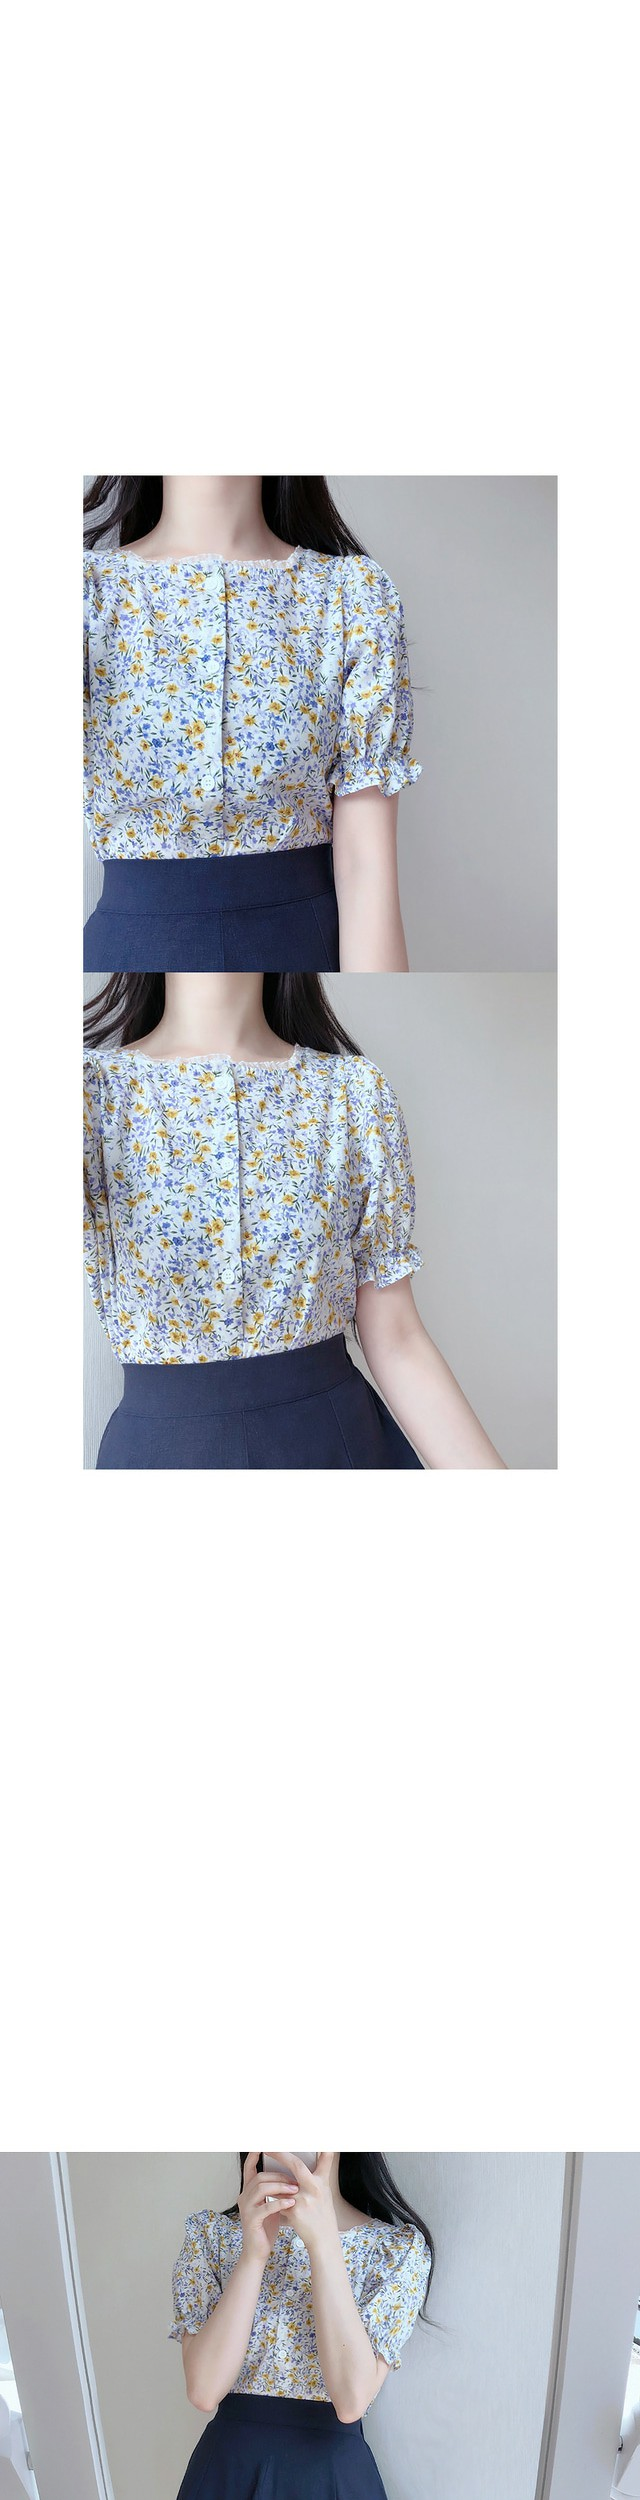 ♥ Cute Square Flower bl